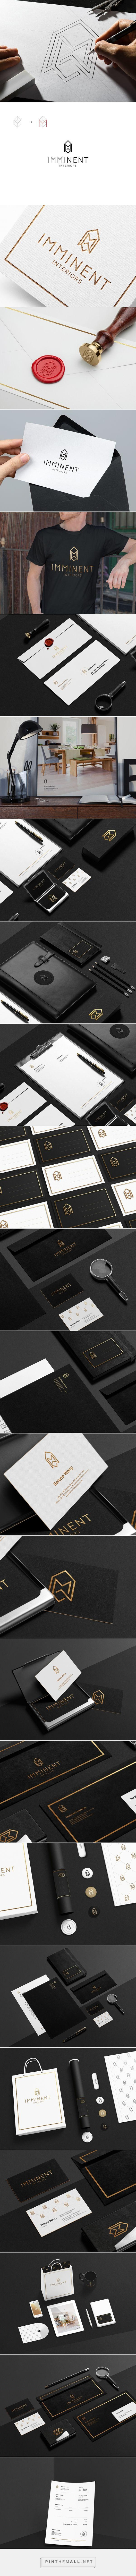 Imminent Interiors - Architect - Branding by Tomasz Mazurczak